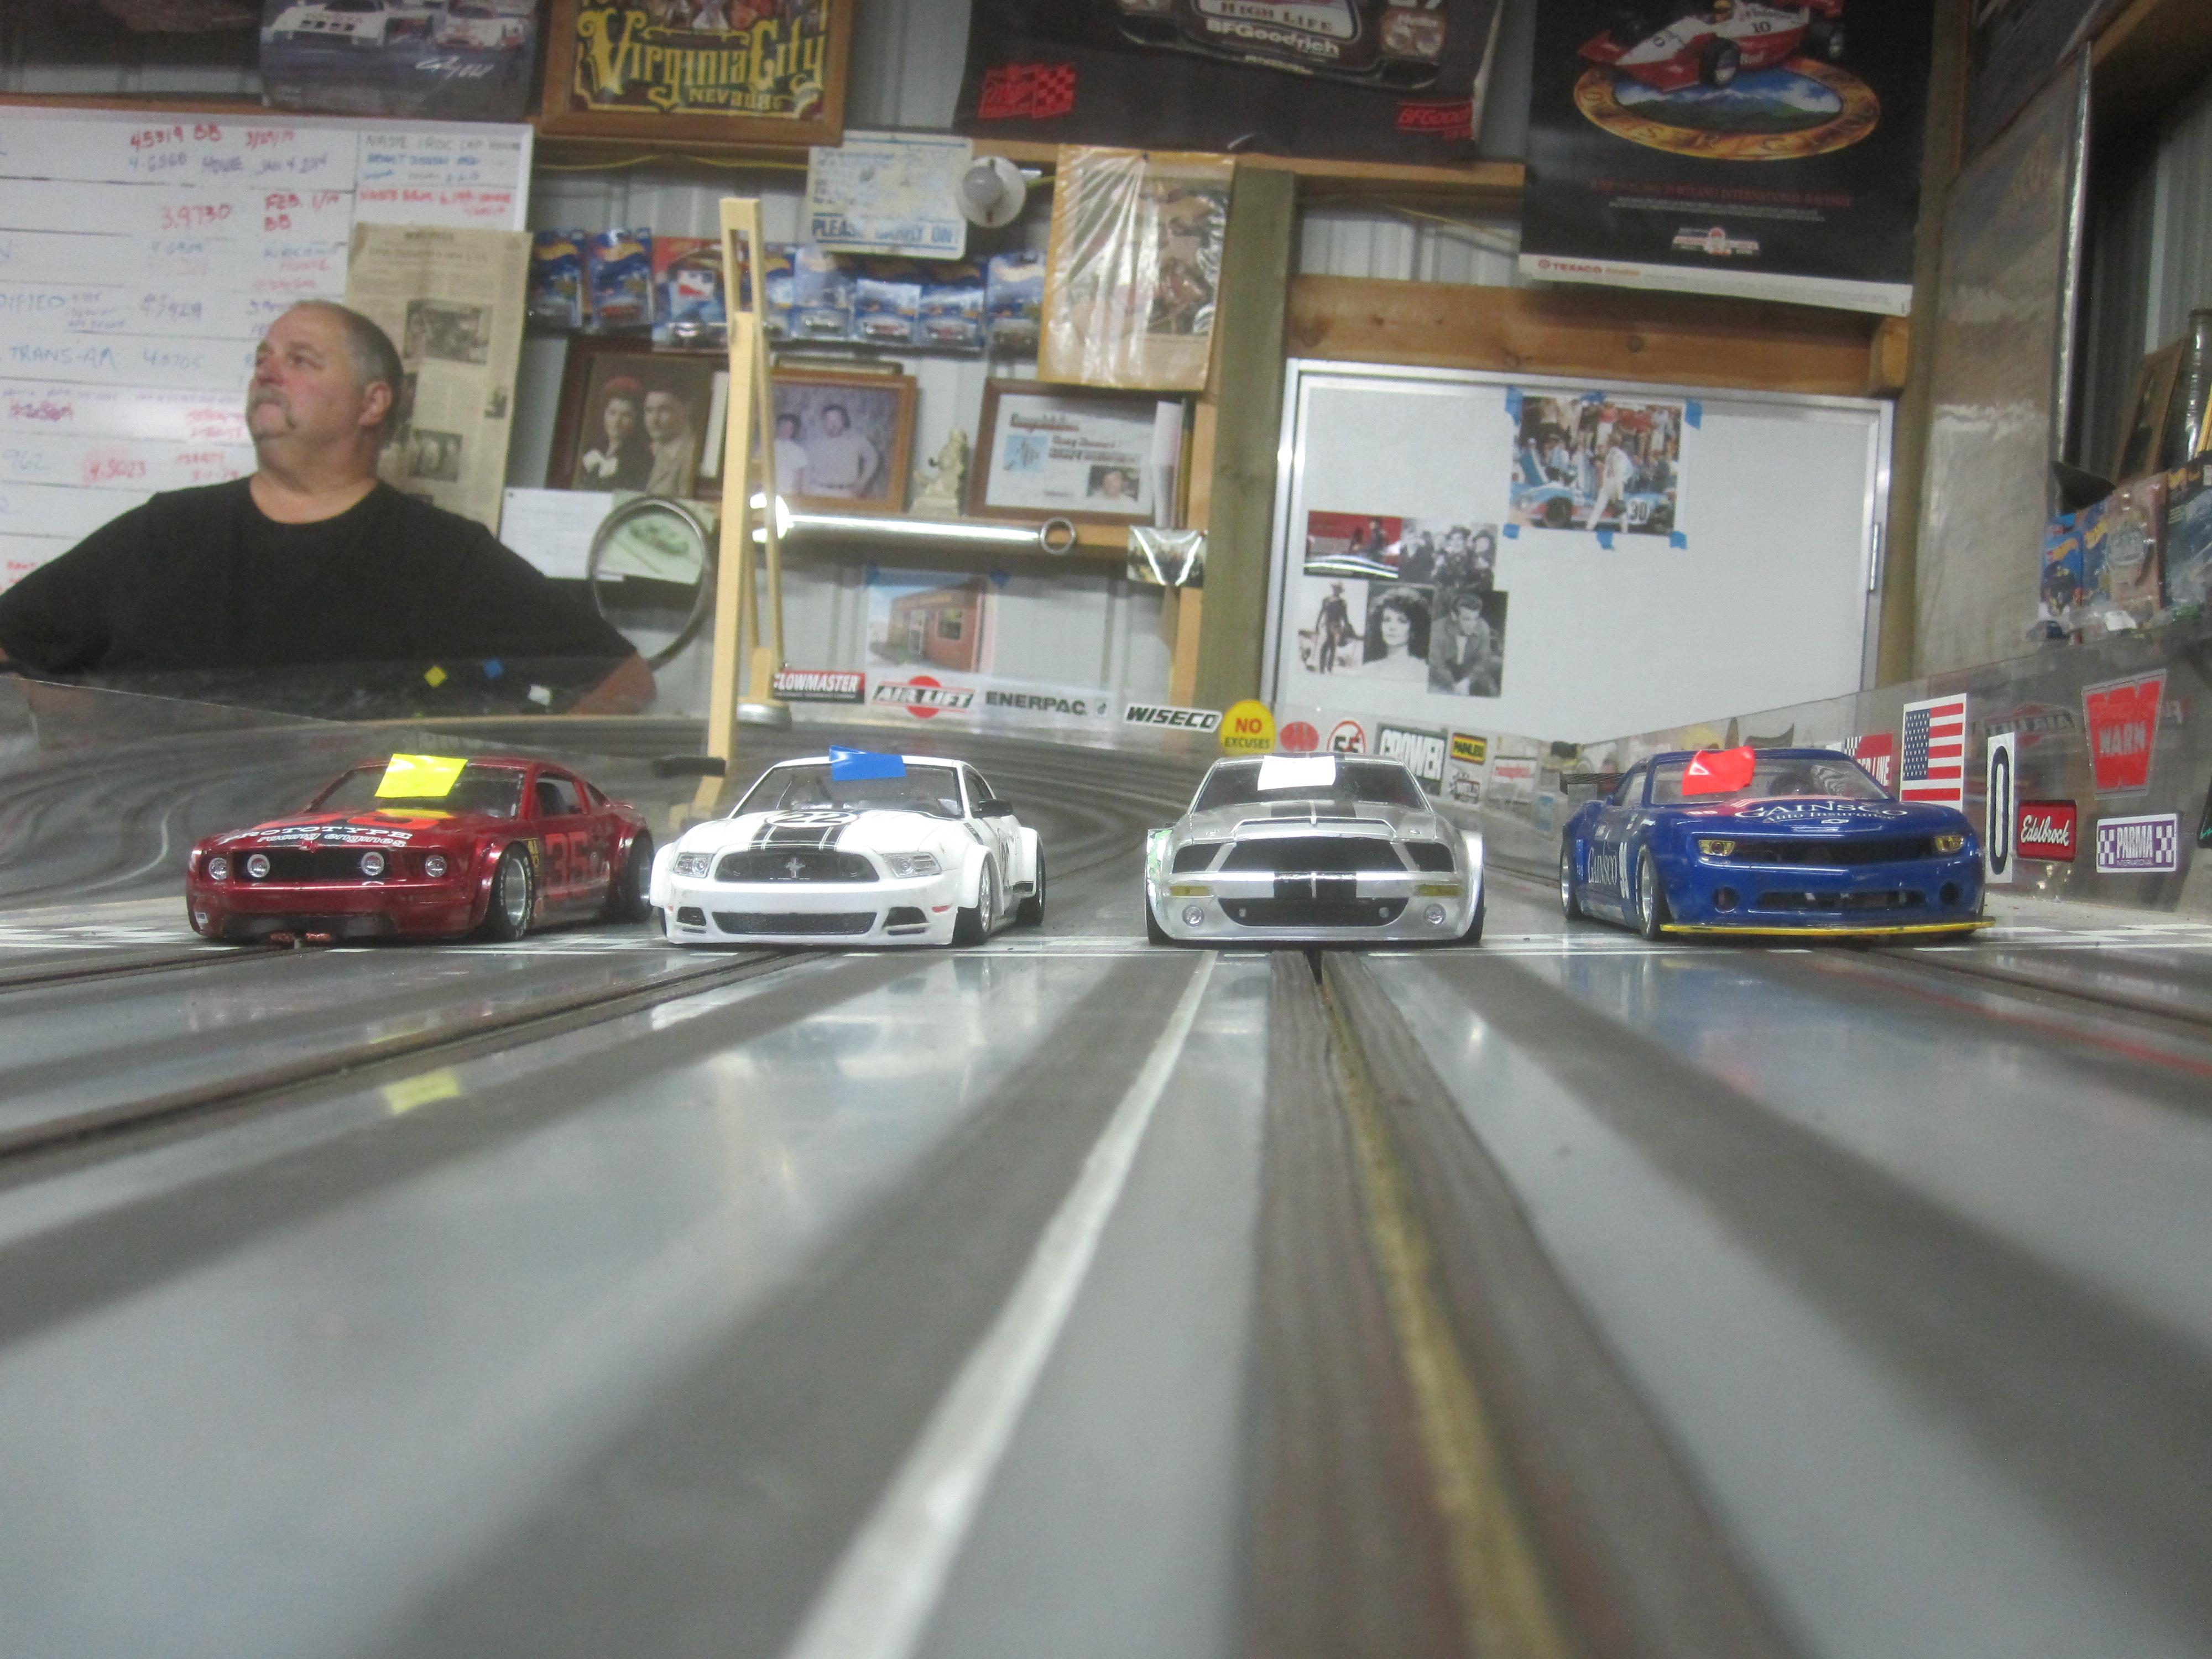 http://www.naste.org/members/bill/RaceResultsTA2z2.jpg